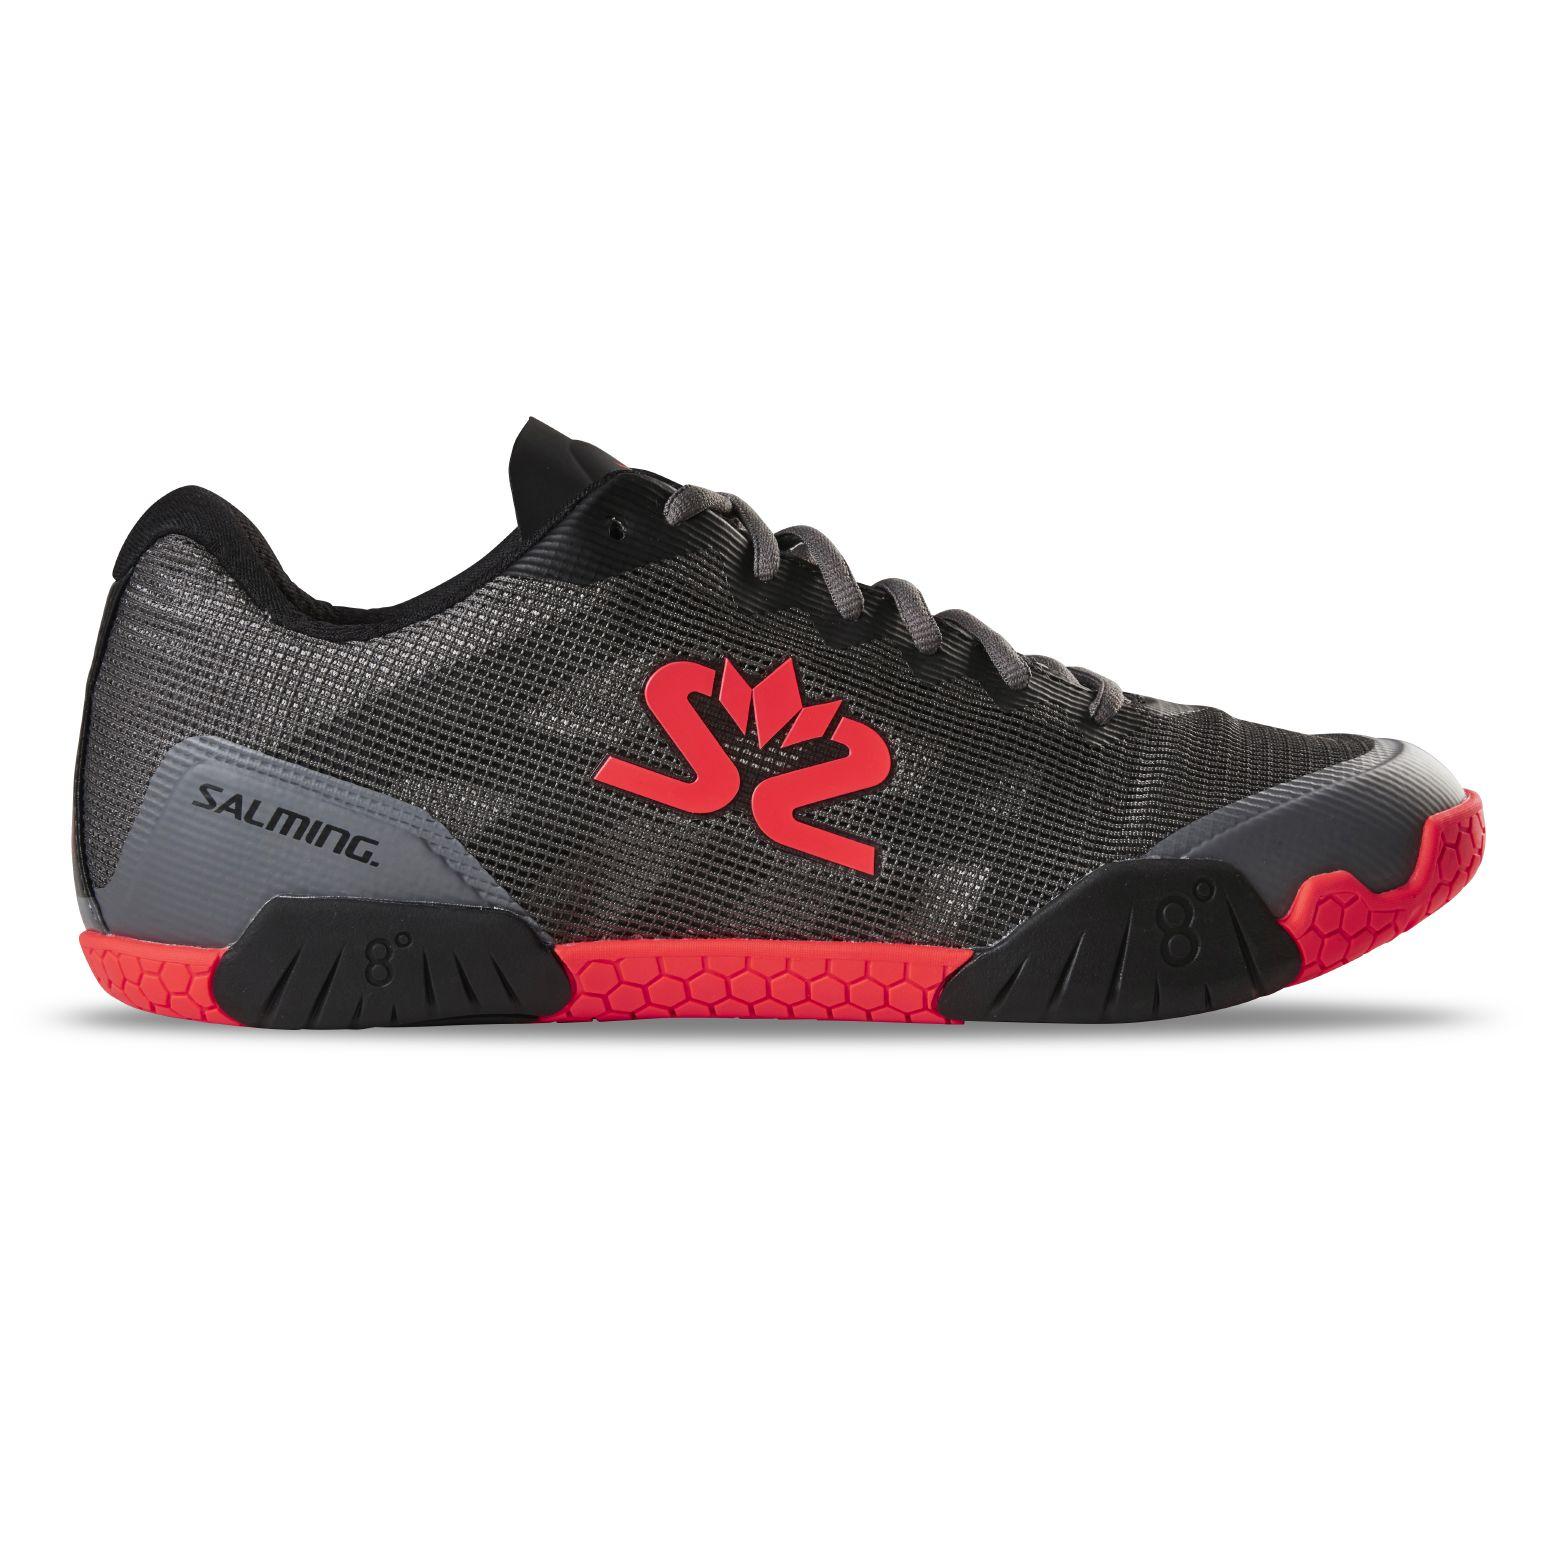 Salming Hawk Shoe Men GunMetal/Red 12 UK - 48 EUR - 31 cm